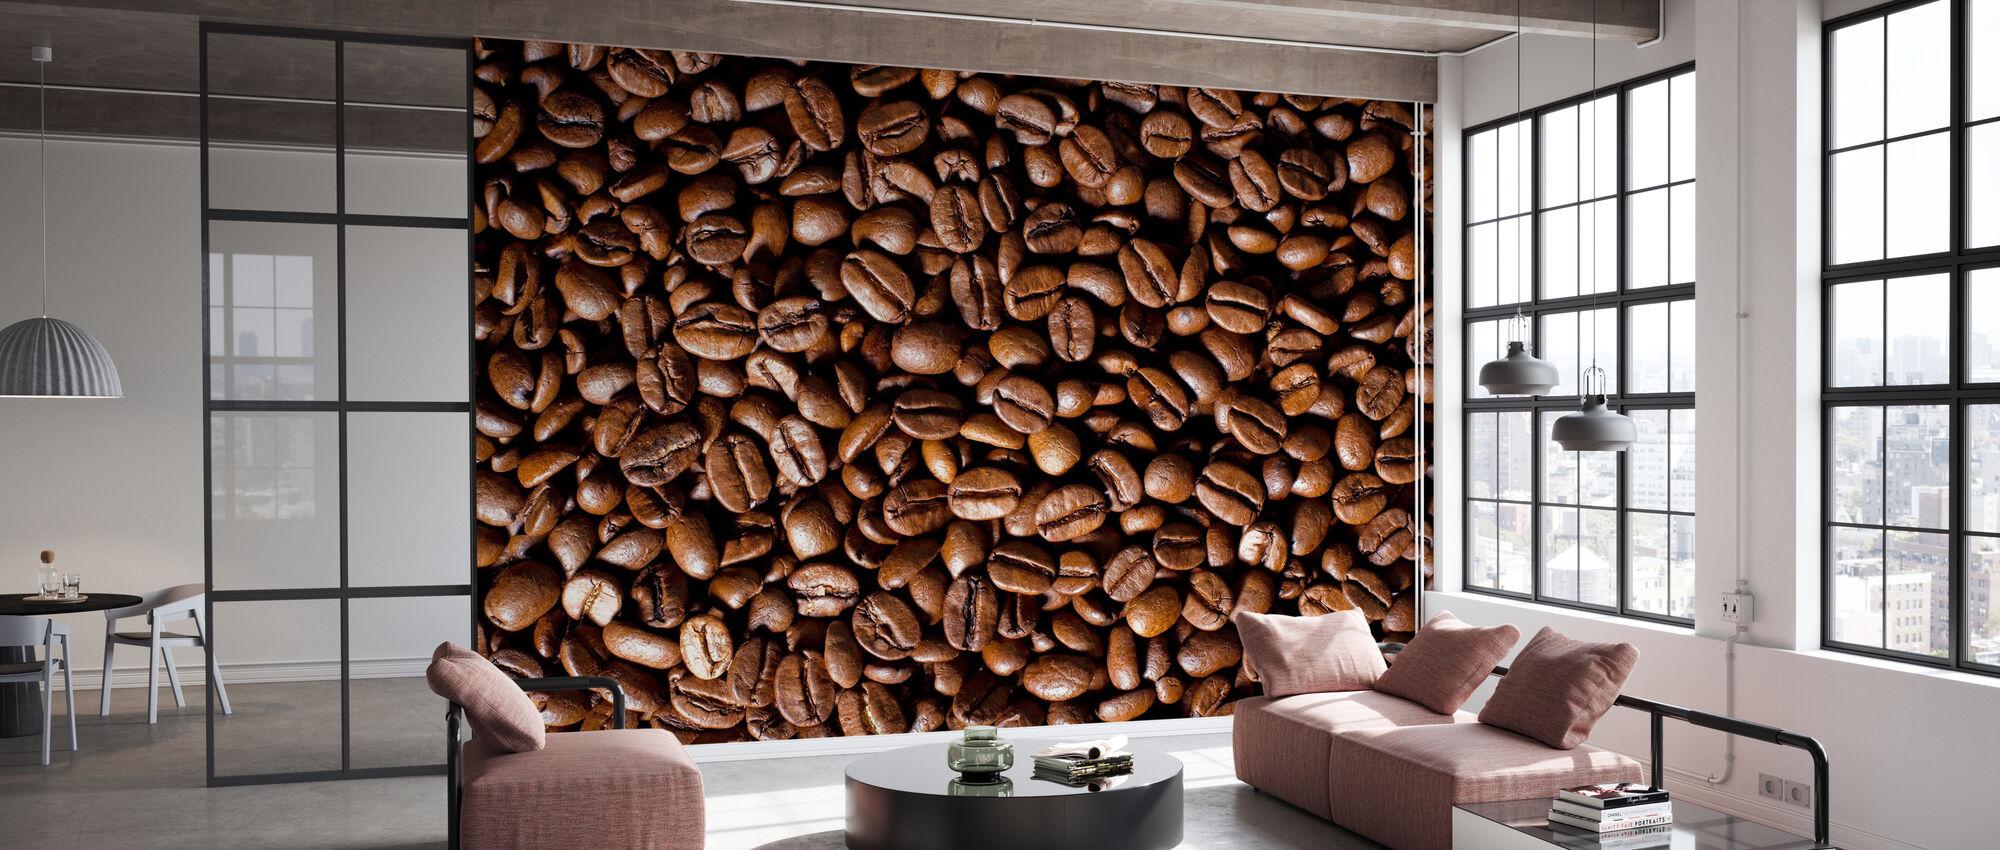 Kaffeebohnen - Tapete - Büro